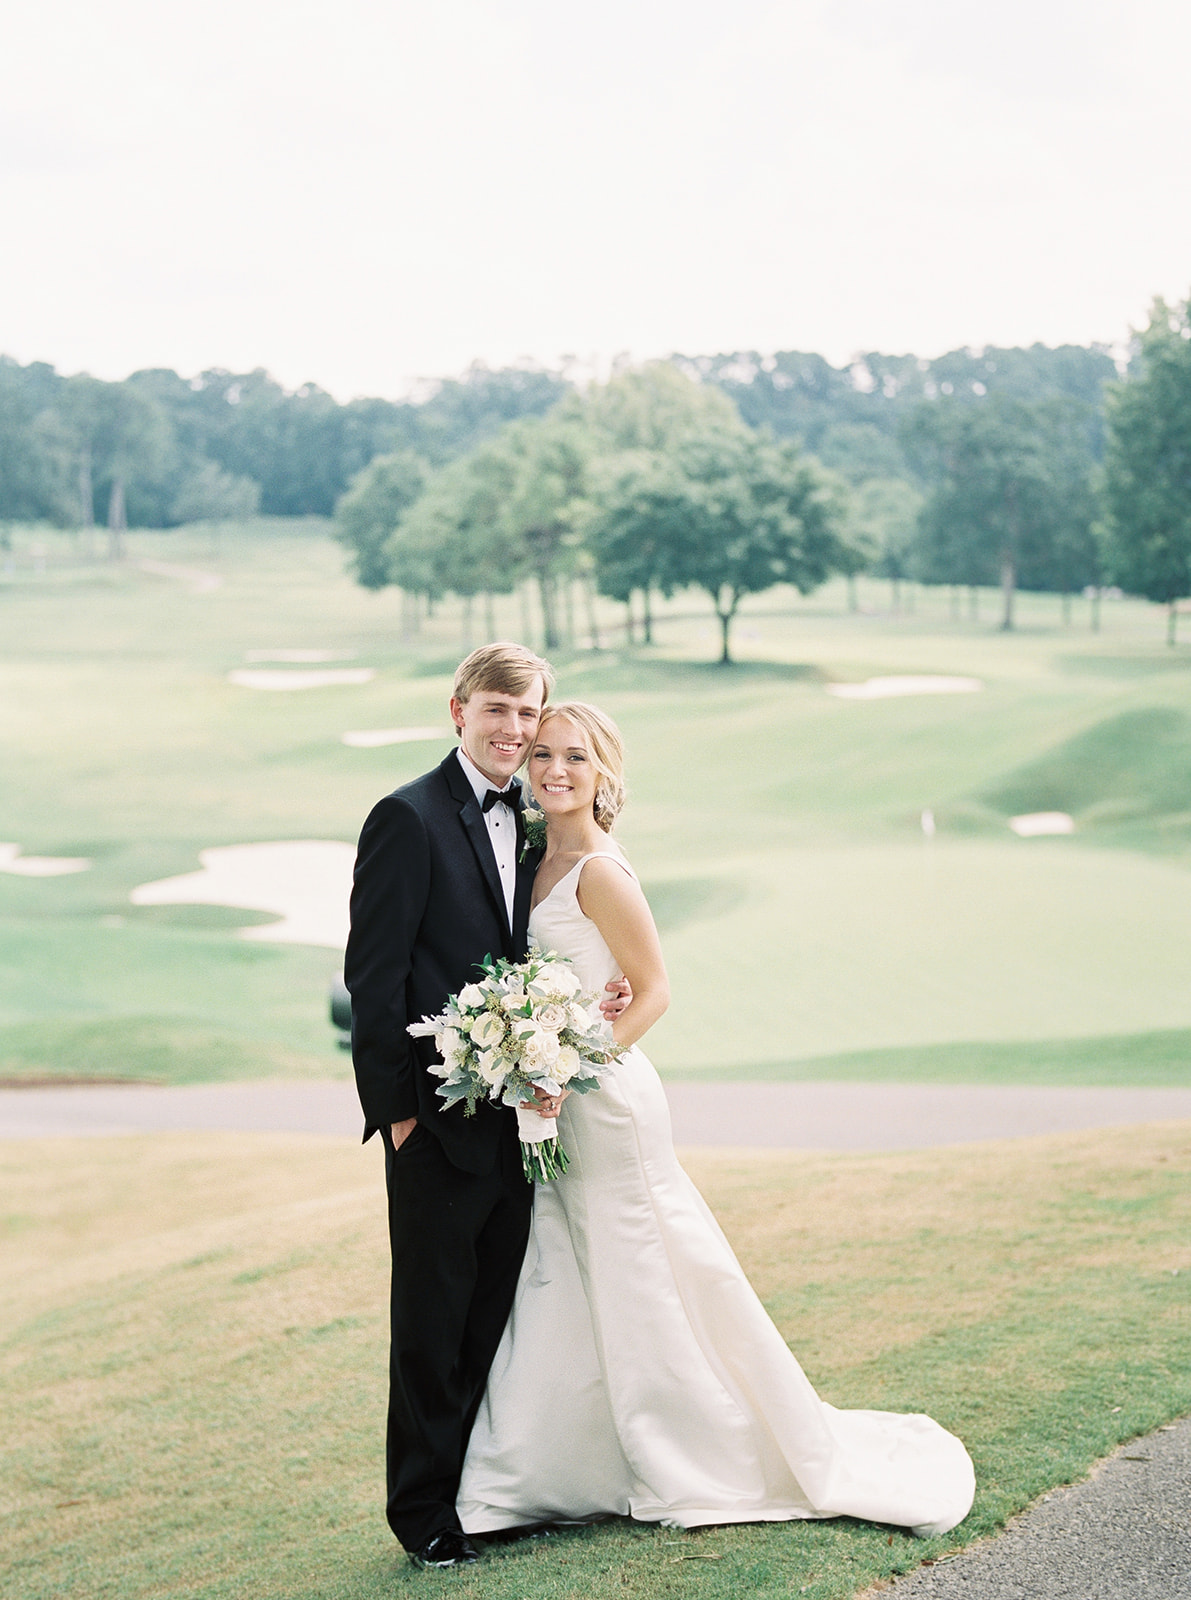 Bride and groom | Country club wedding | Birmingham, Alabama wedding | Taylor Dane Photography | Custom wedding invitations by Little Fox Paperie | Gracie Nunez